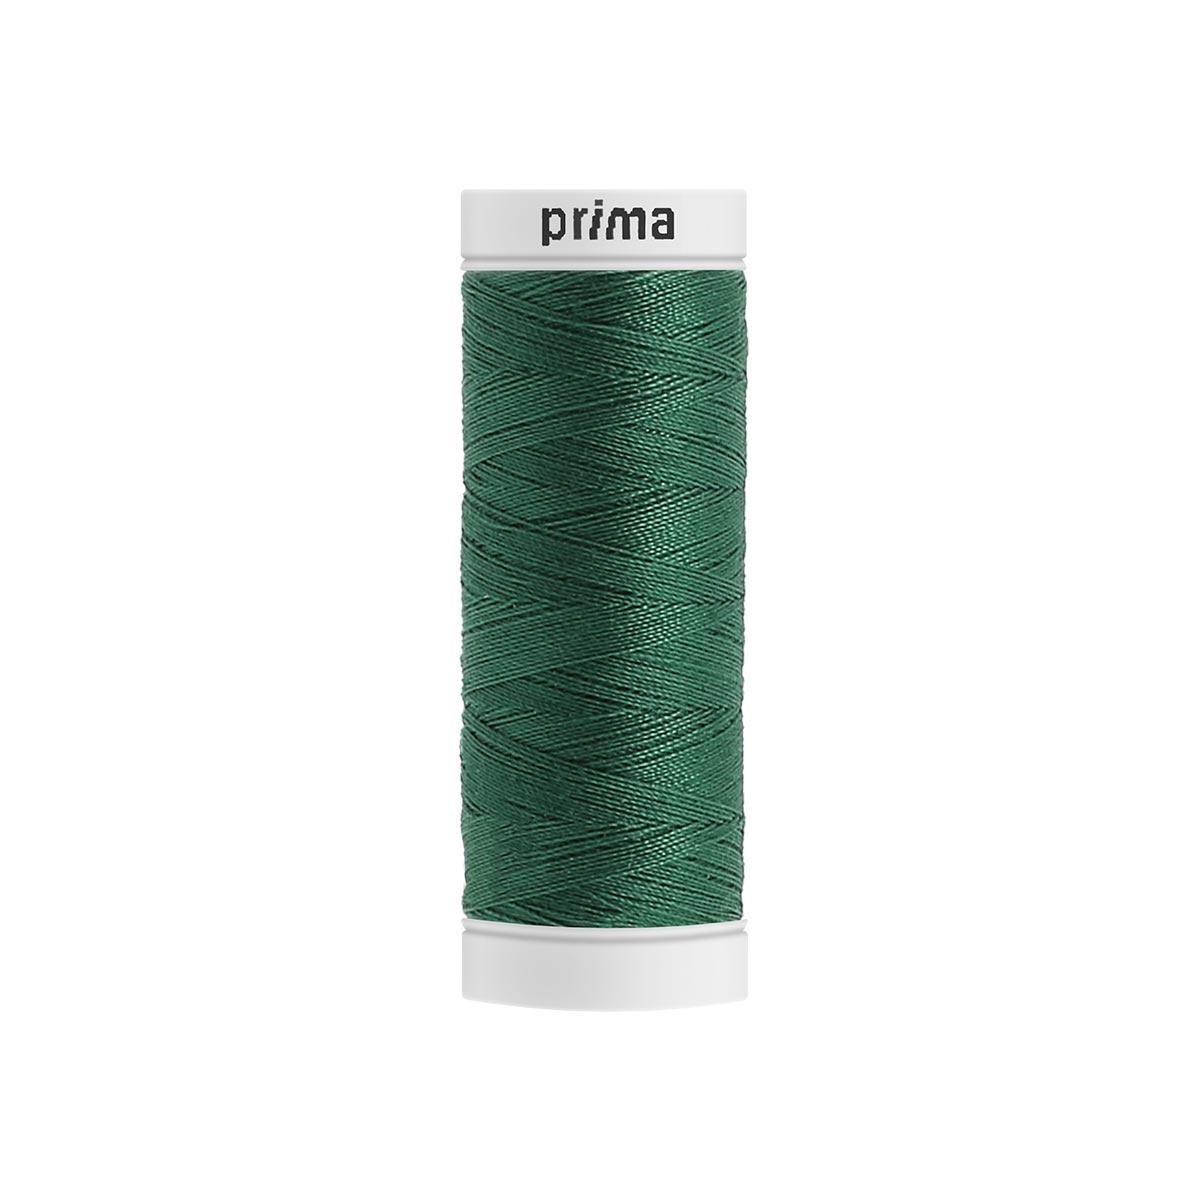 Fil à coudre polyester 200m sapin - Prima Mercerie